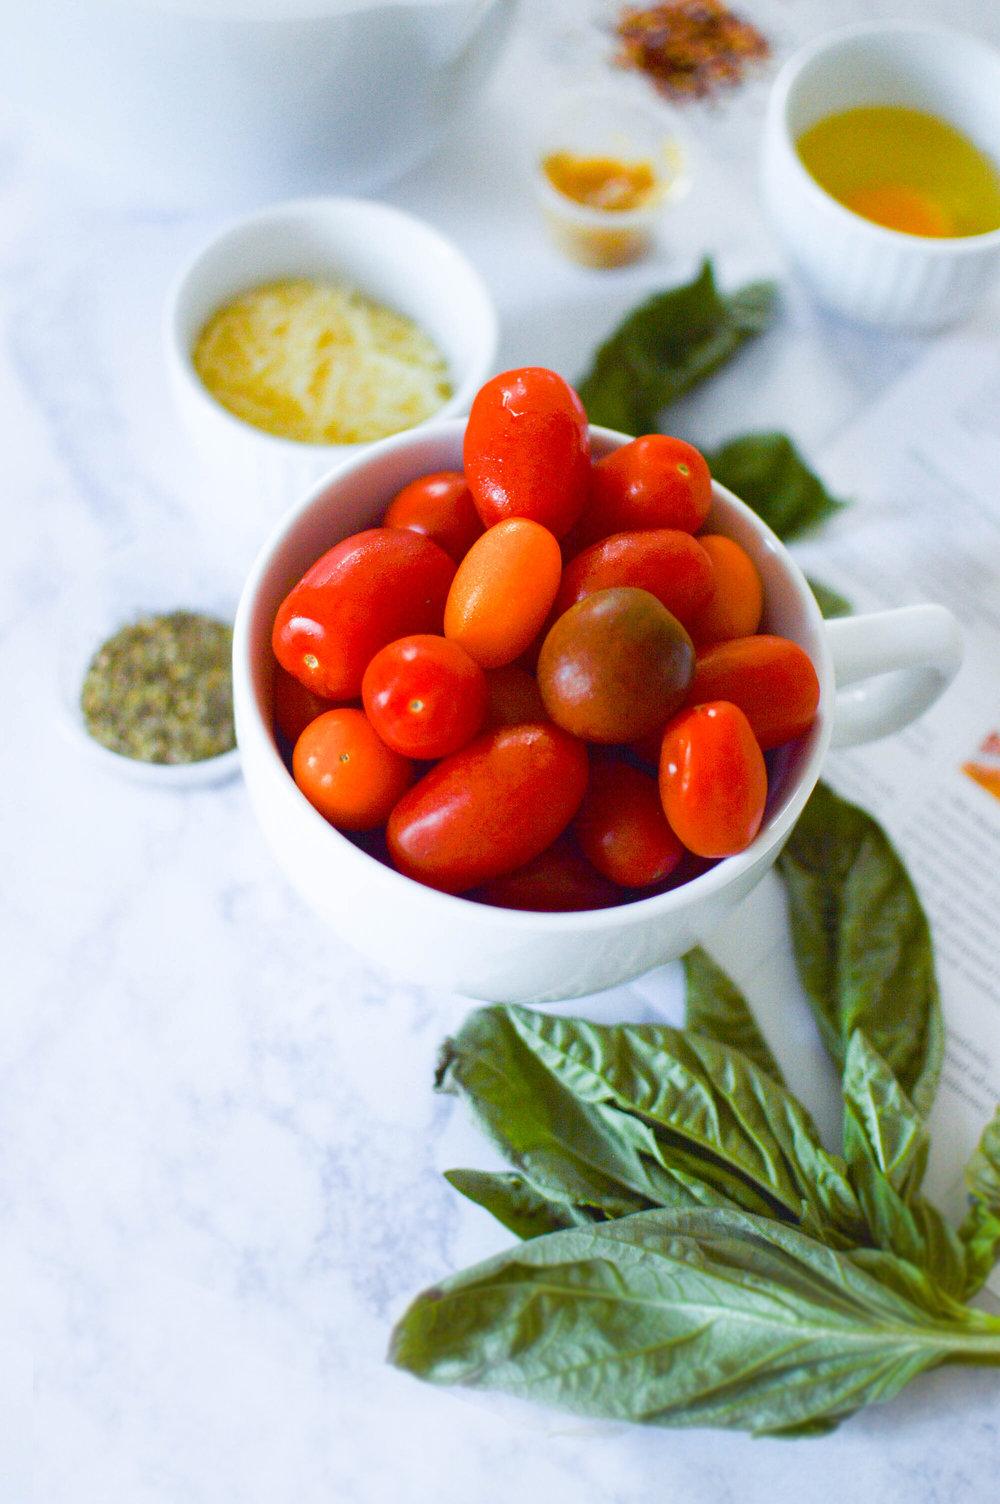 Weeknight Dinners with Terra's Kitchen via. www.birdieshoots.com get $30 off with code BIRDIE30